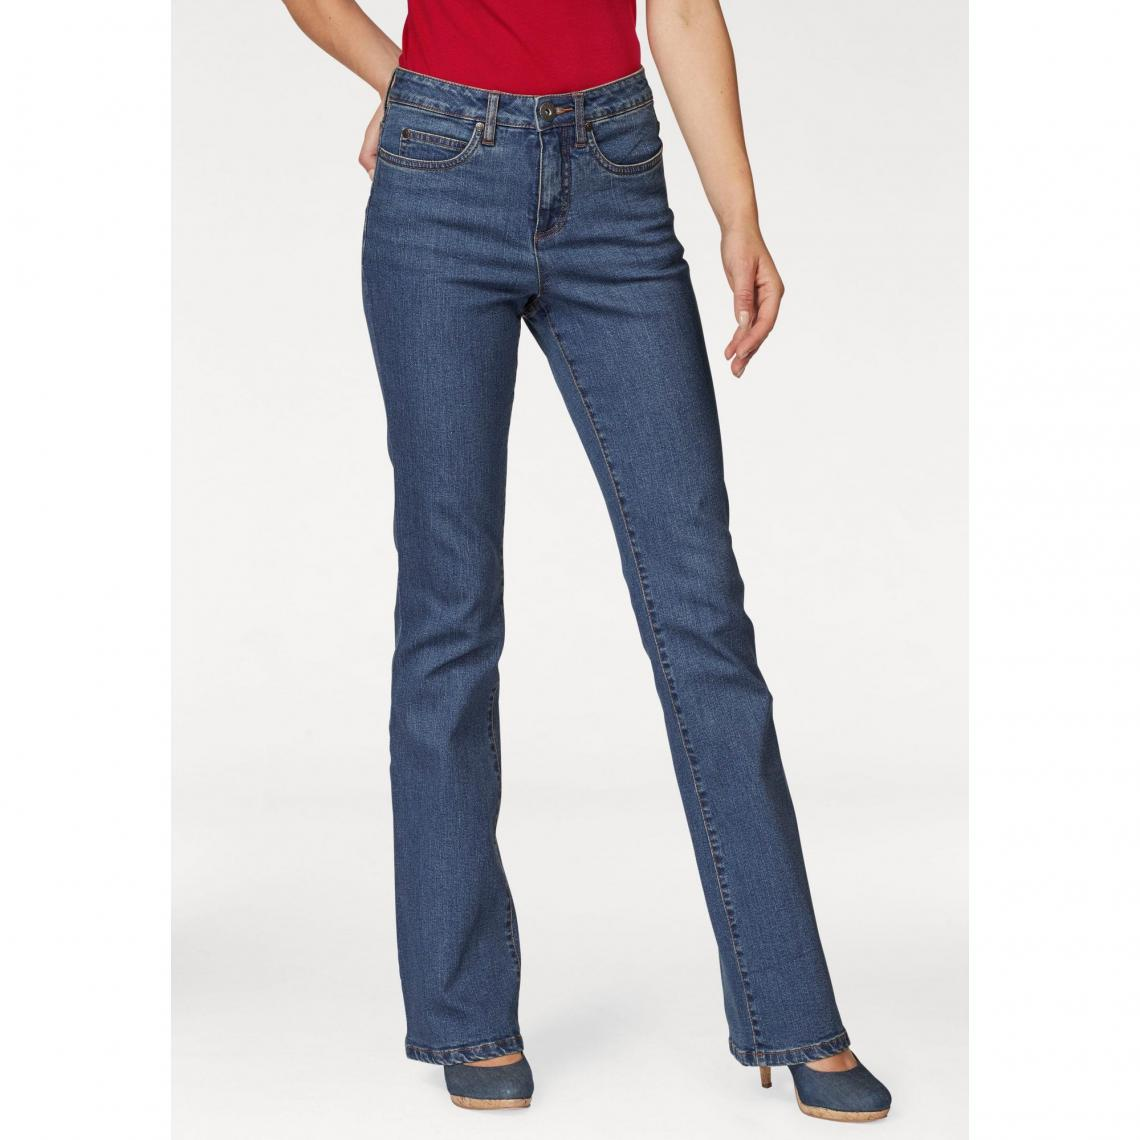 795e3956d0cf4 Jean bootcut taille haute extra confort femme Arizona - Bleu Stone Arizona  Femme